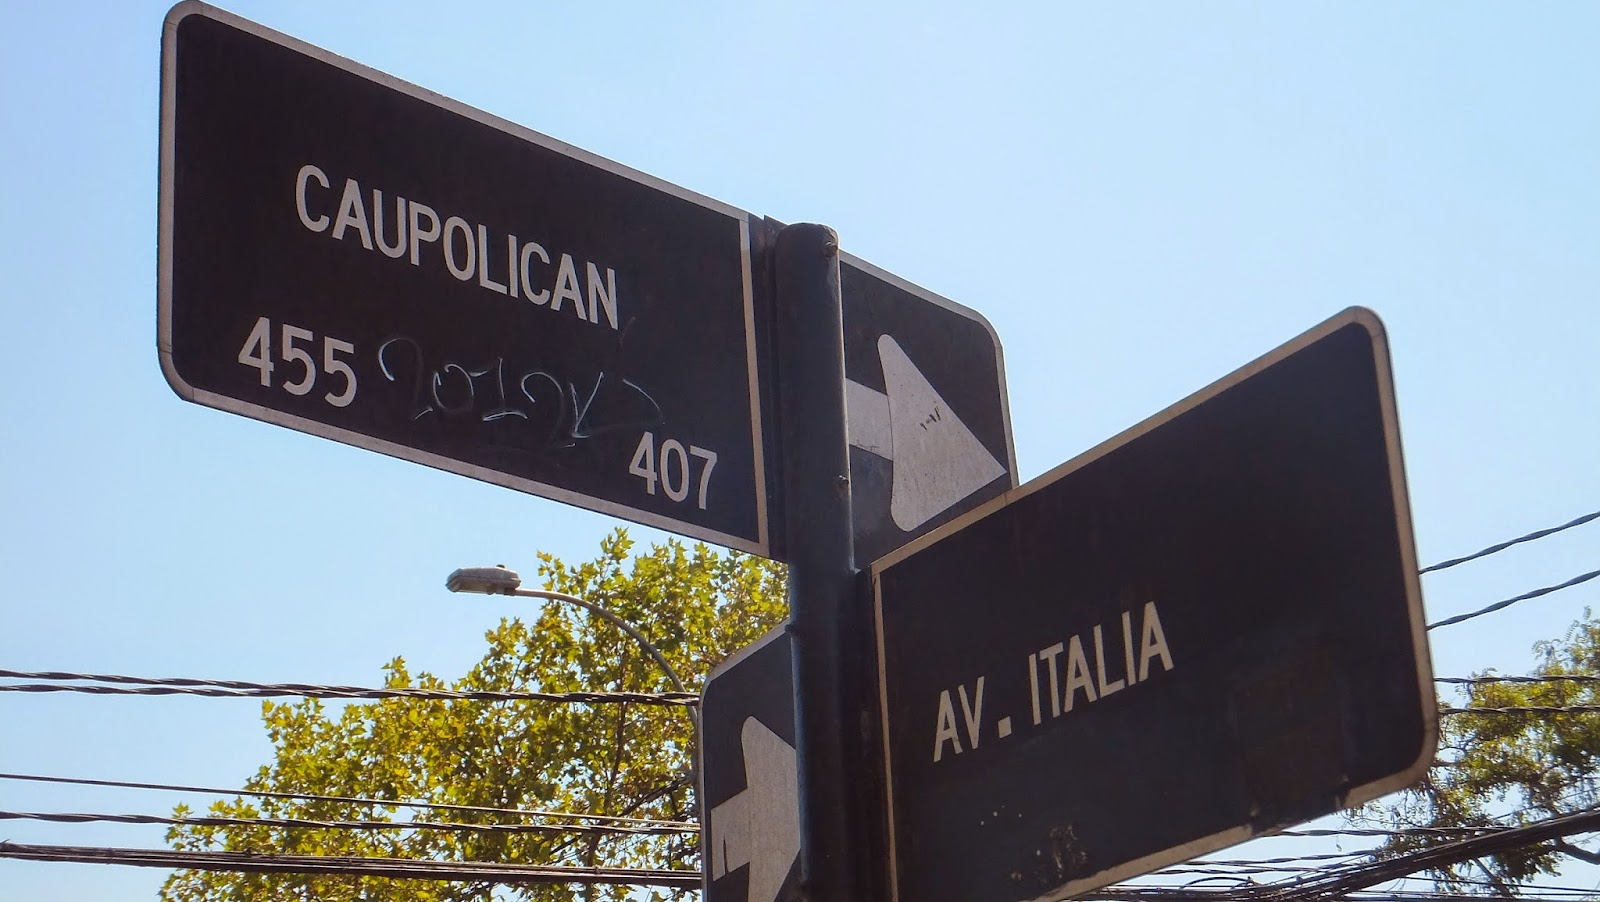 Barrio Italia, Santiago, Chile, Elisa N, Blog de Viajes, Lifestyle, Travel